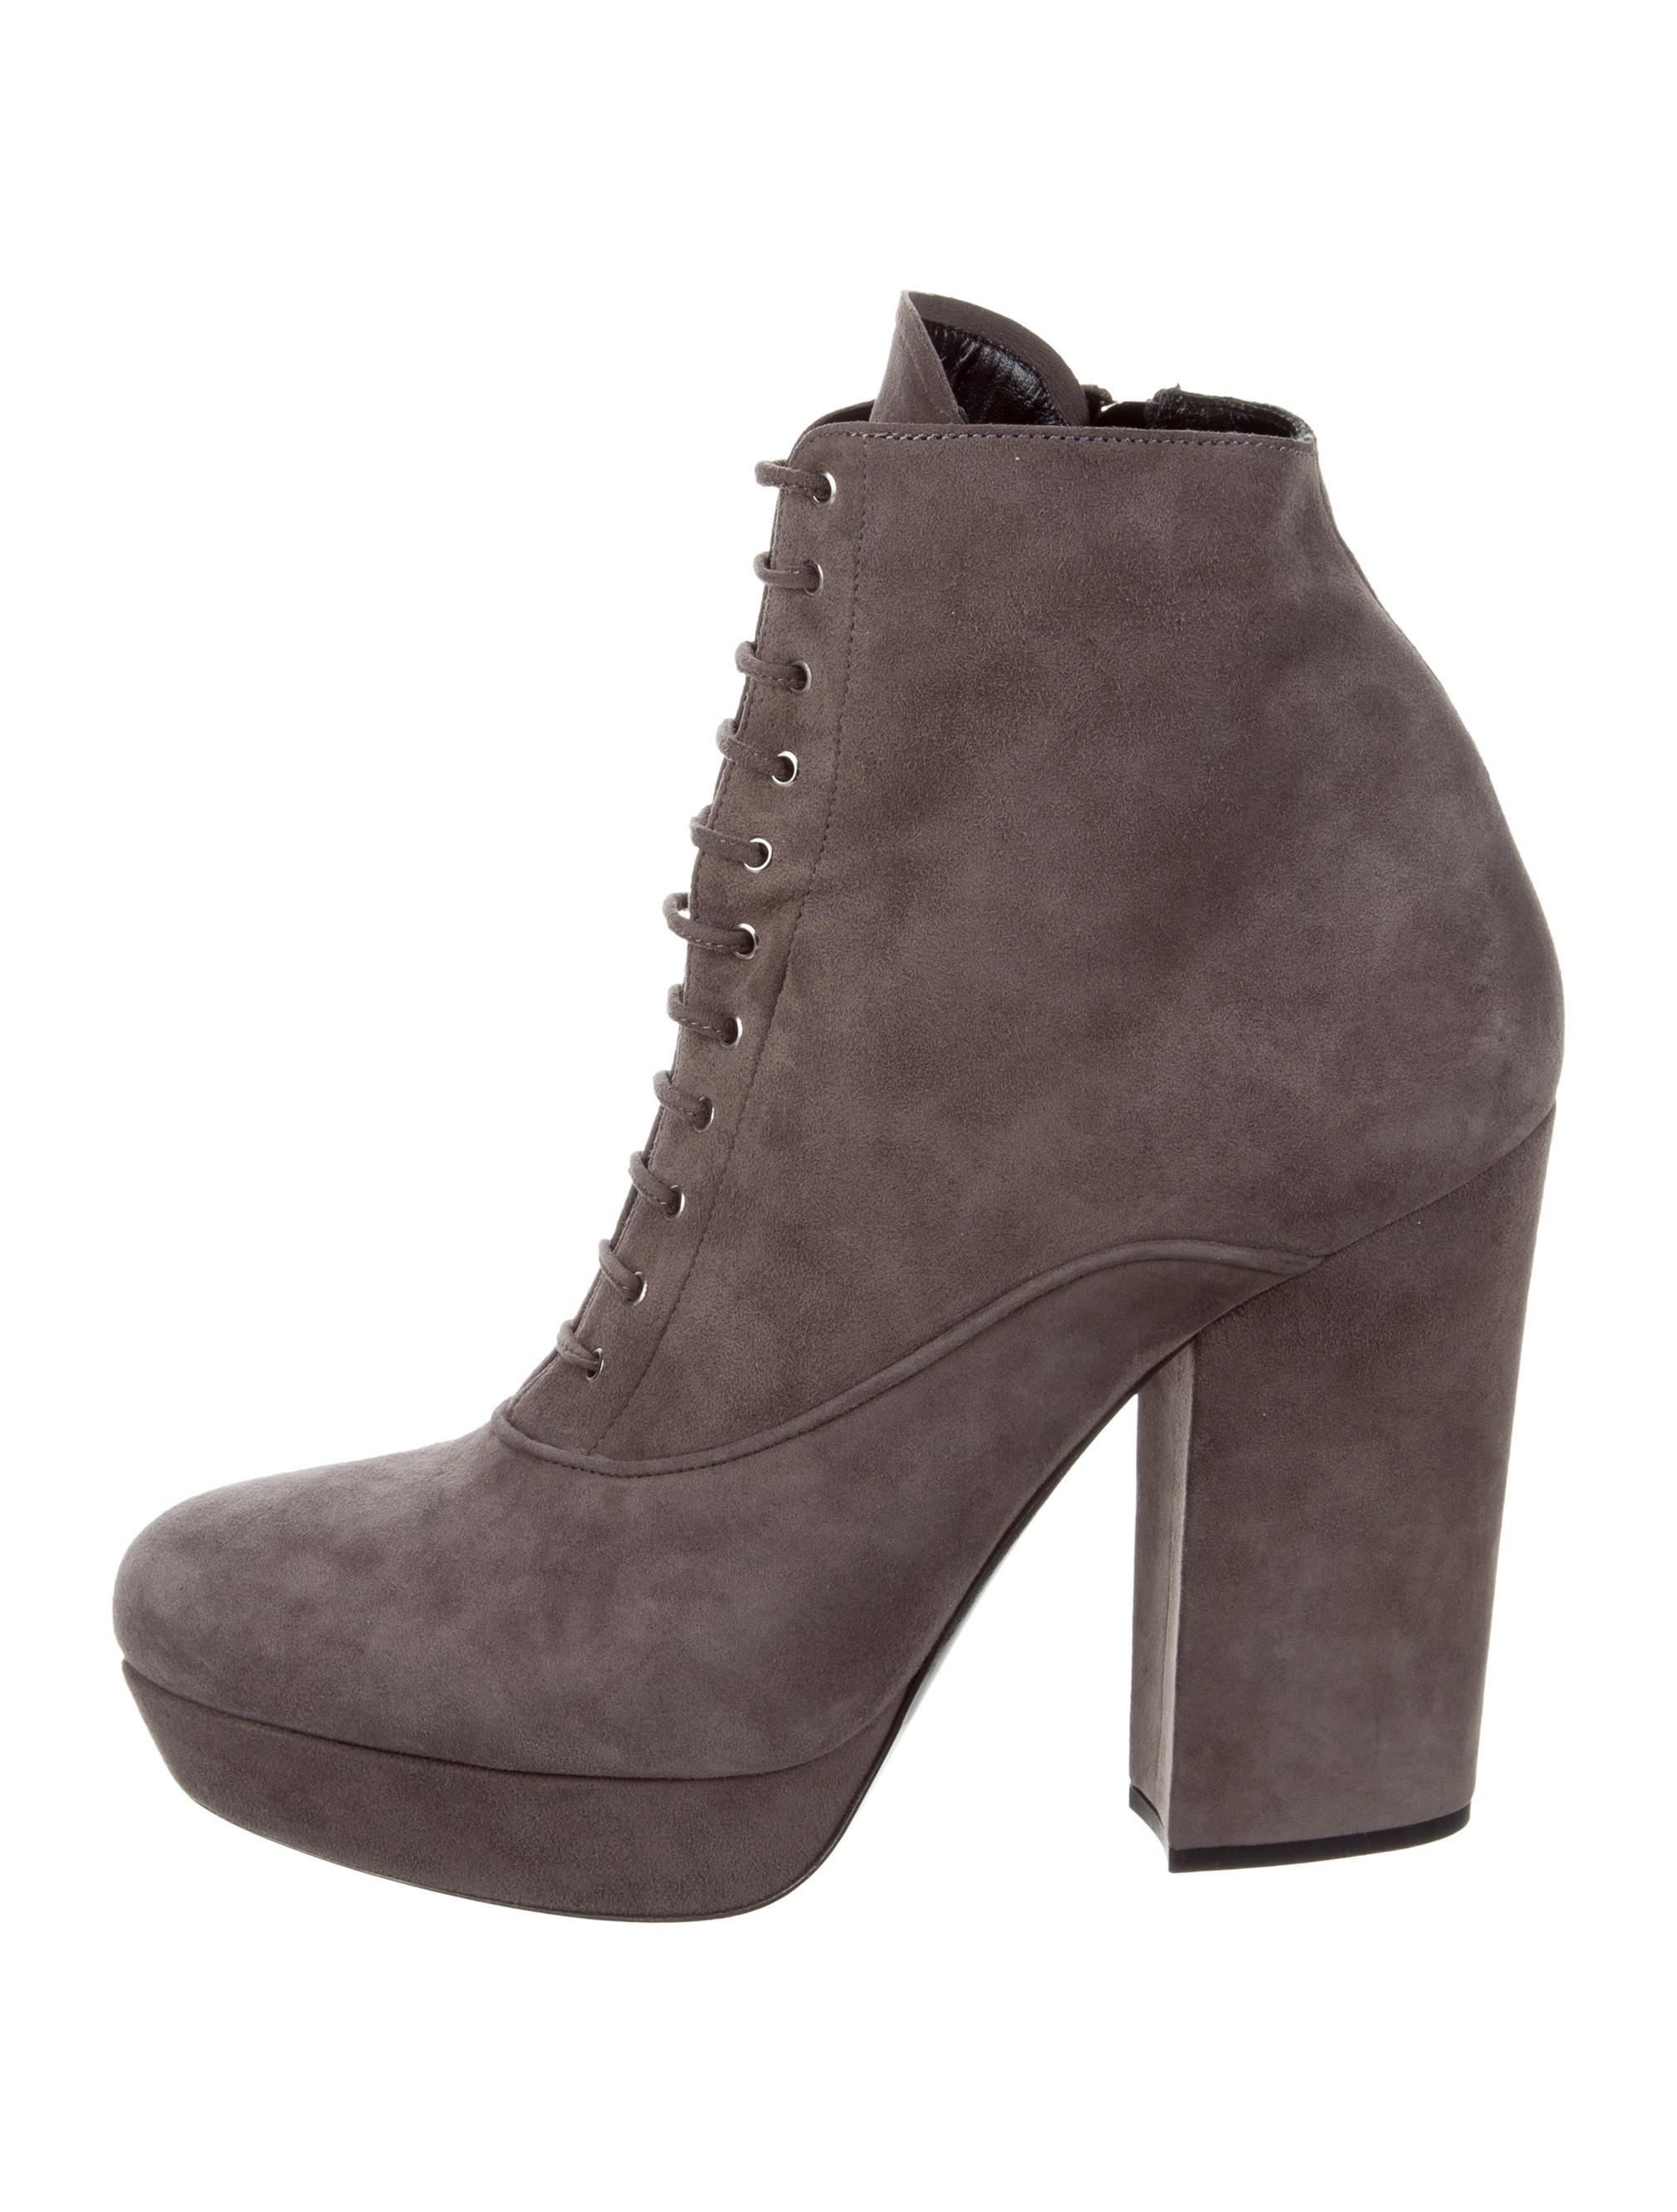 miu miu suede platform ankle boots shoes miu54789